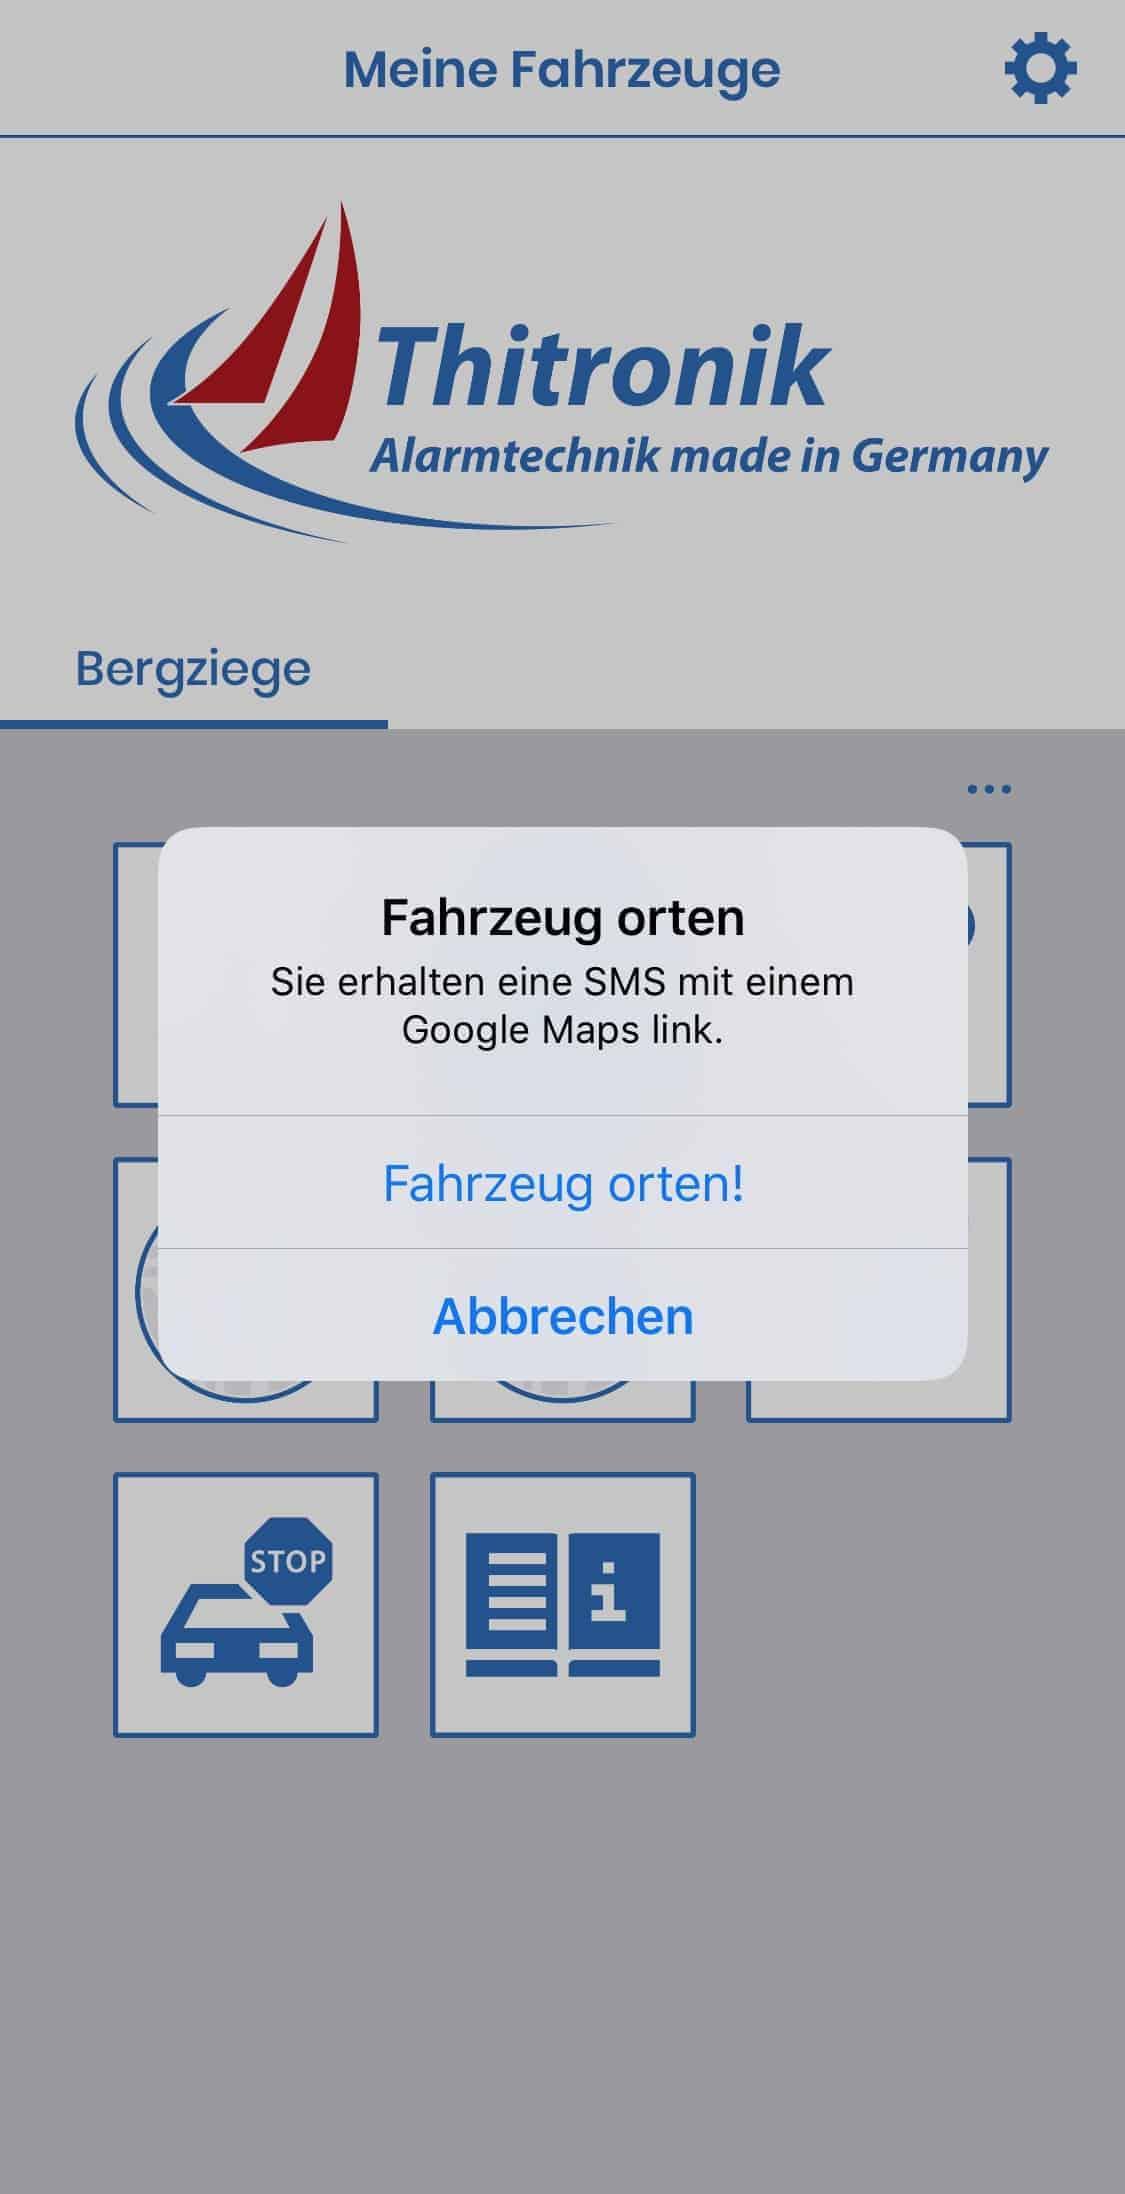 Thitronik_App_Fahrzeug_orten